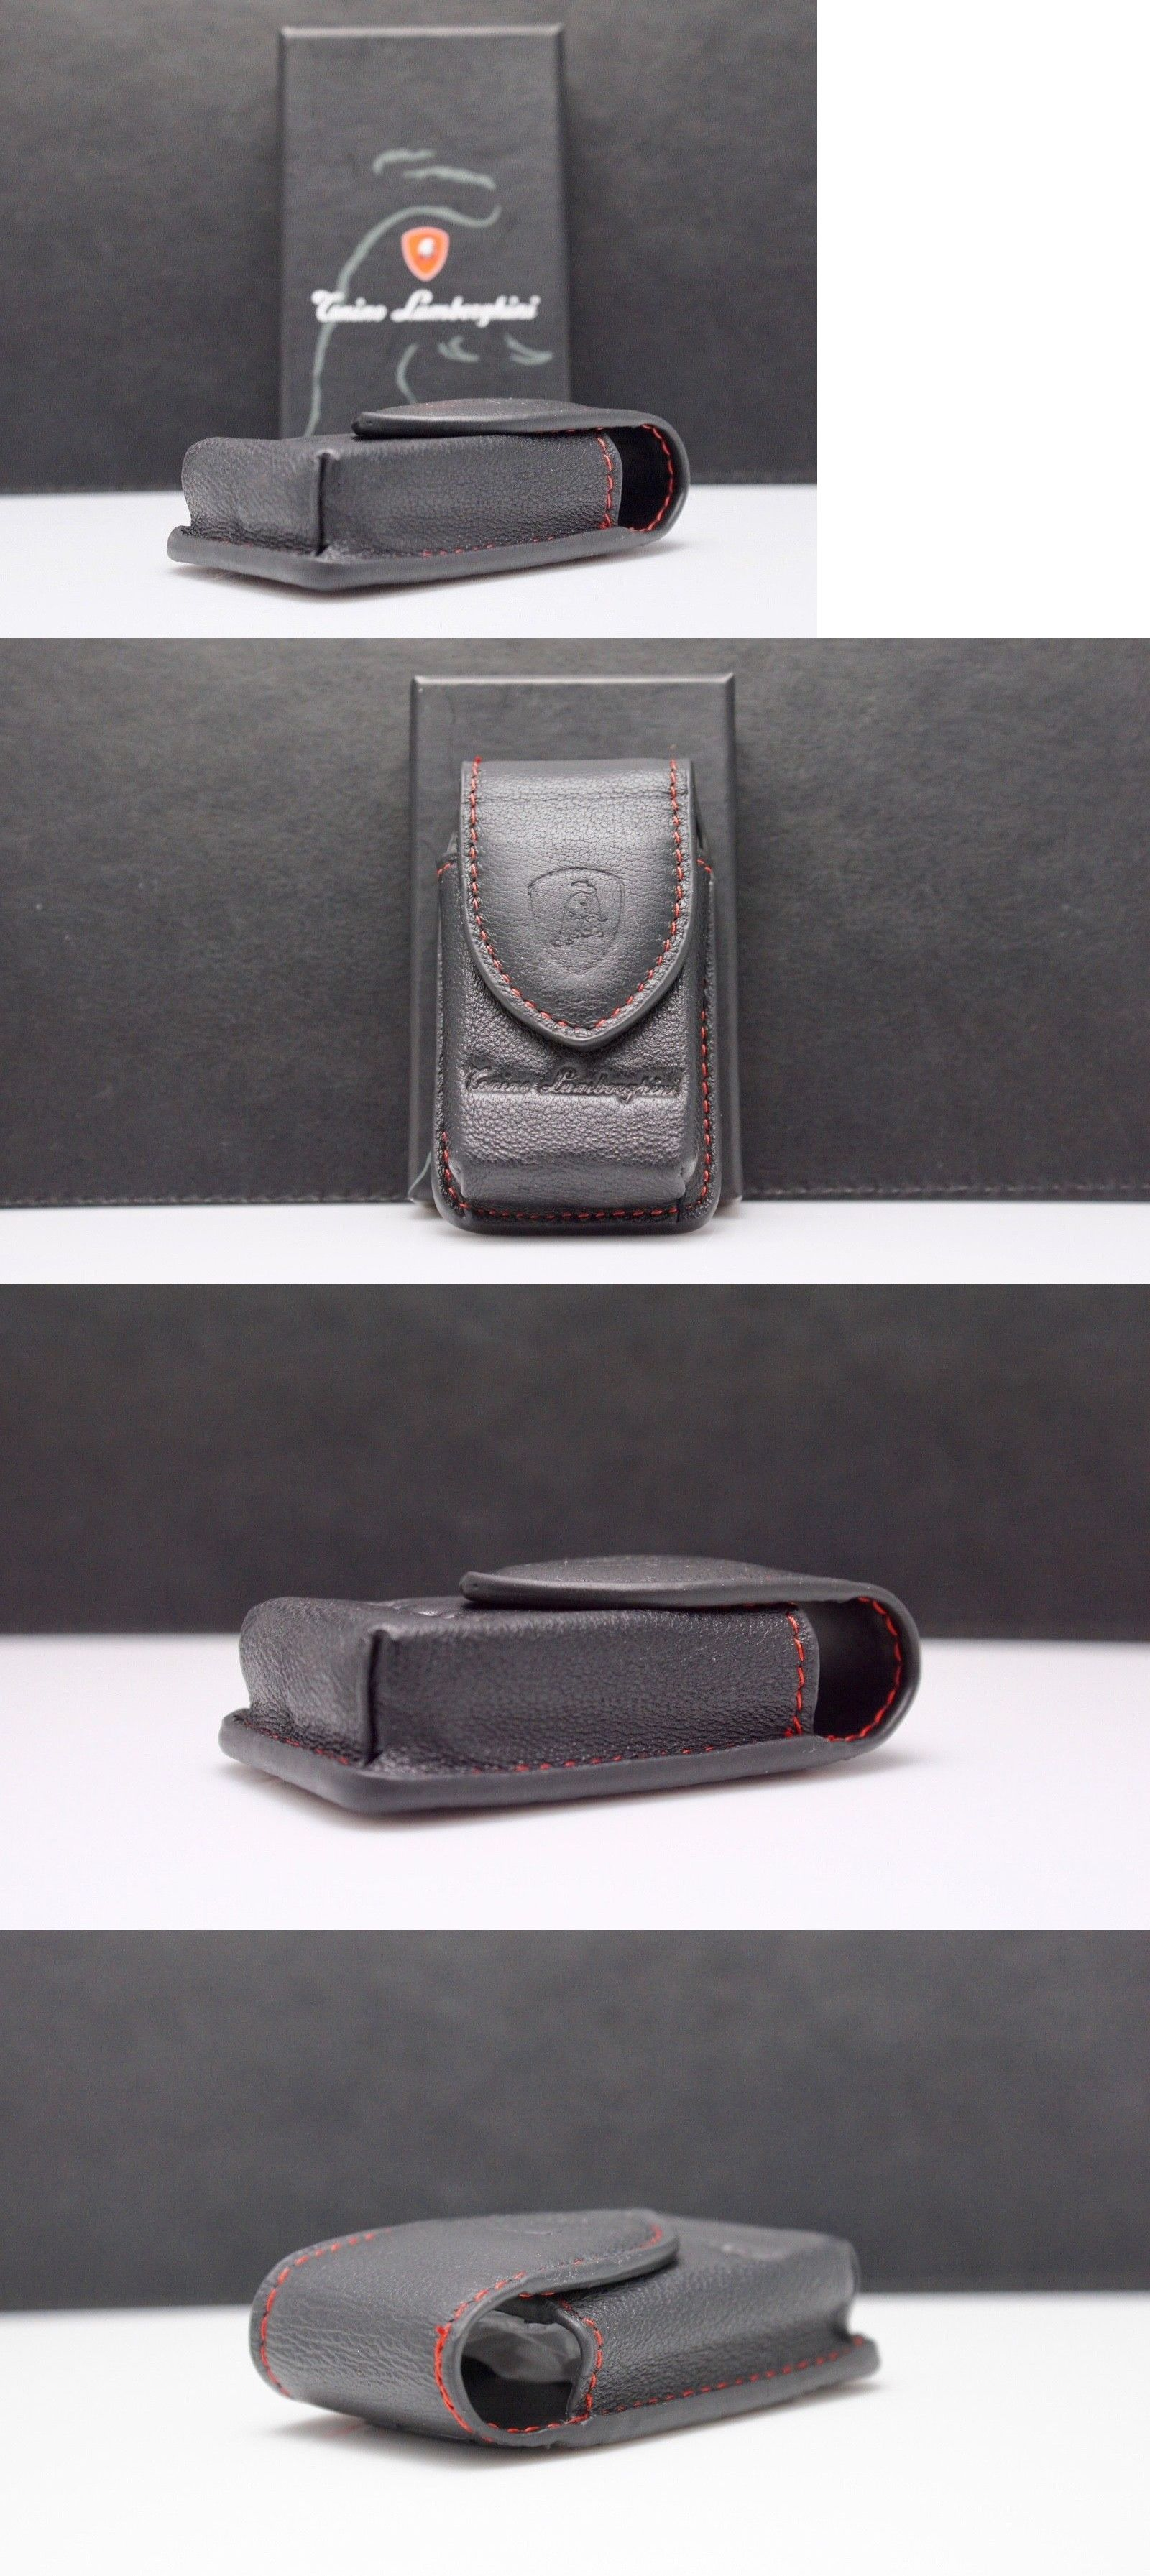 Key Chains Rings And Cases 52373 Tonino Lamborghini Black Leather